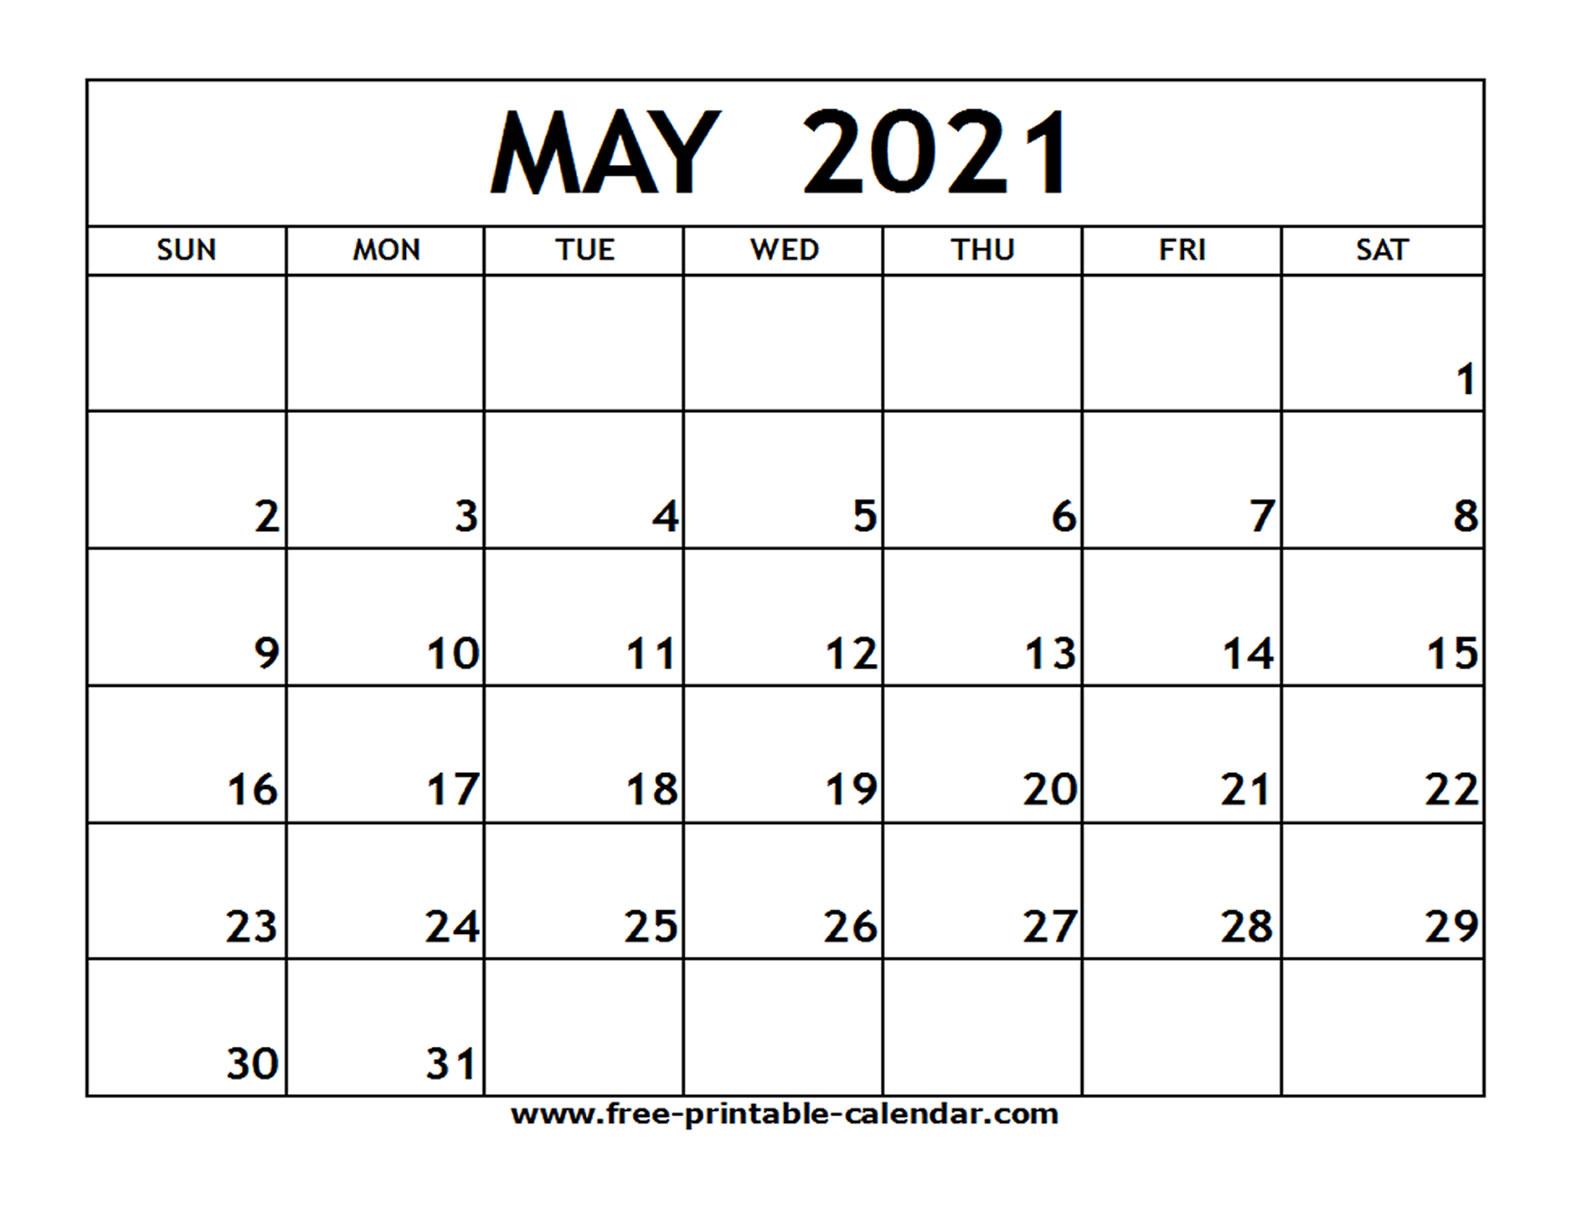 Calendar Template April May 2021 | Free Printable Calendar